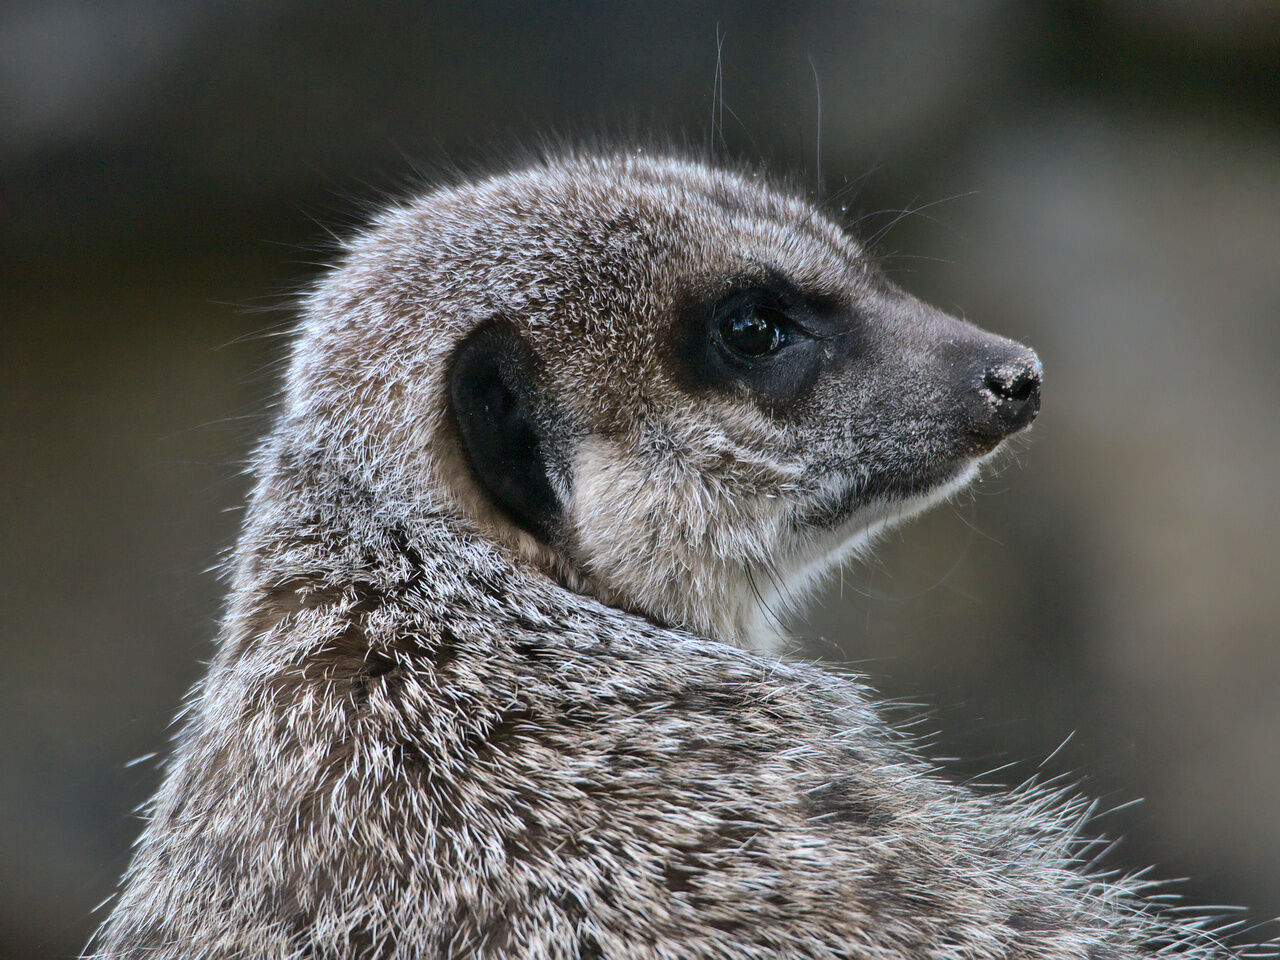 20200524_Zoo_Landau_017